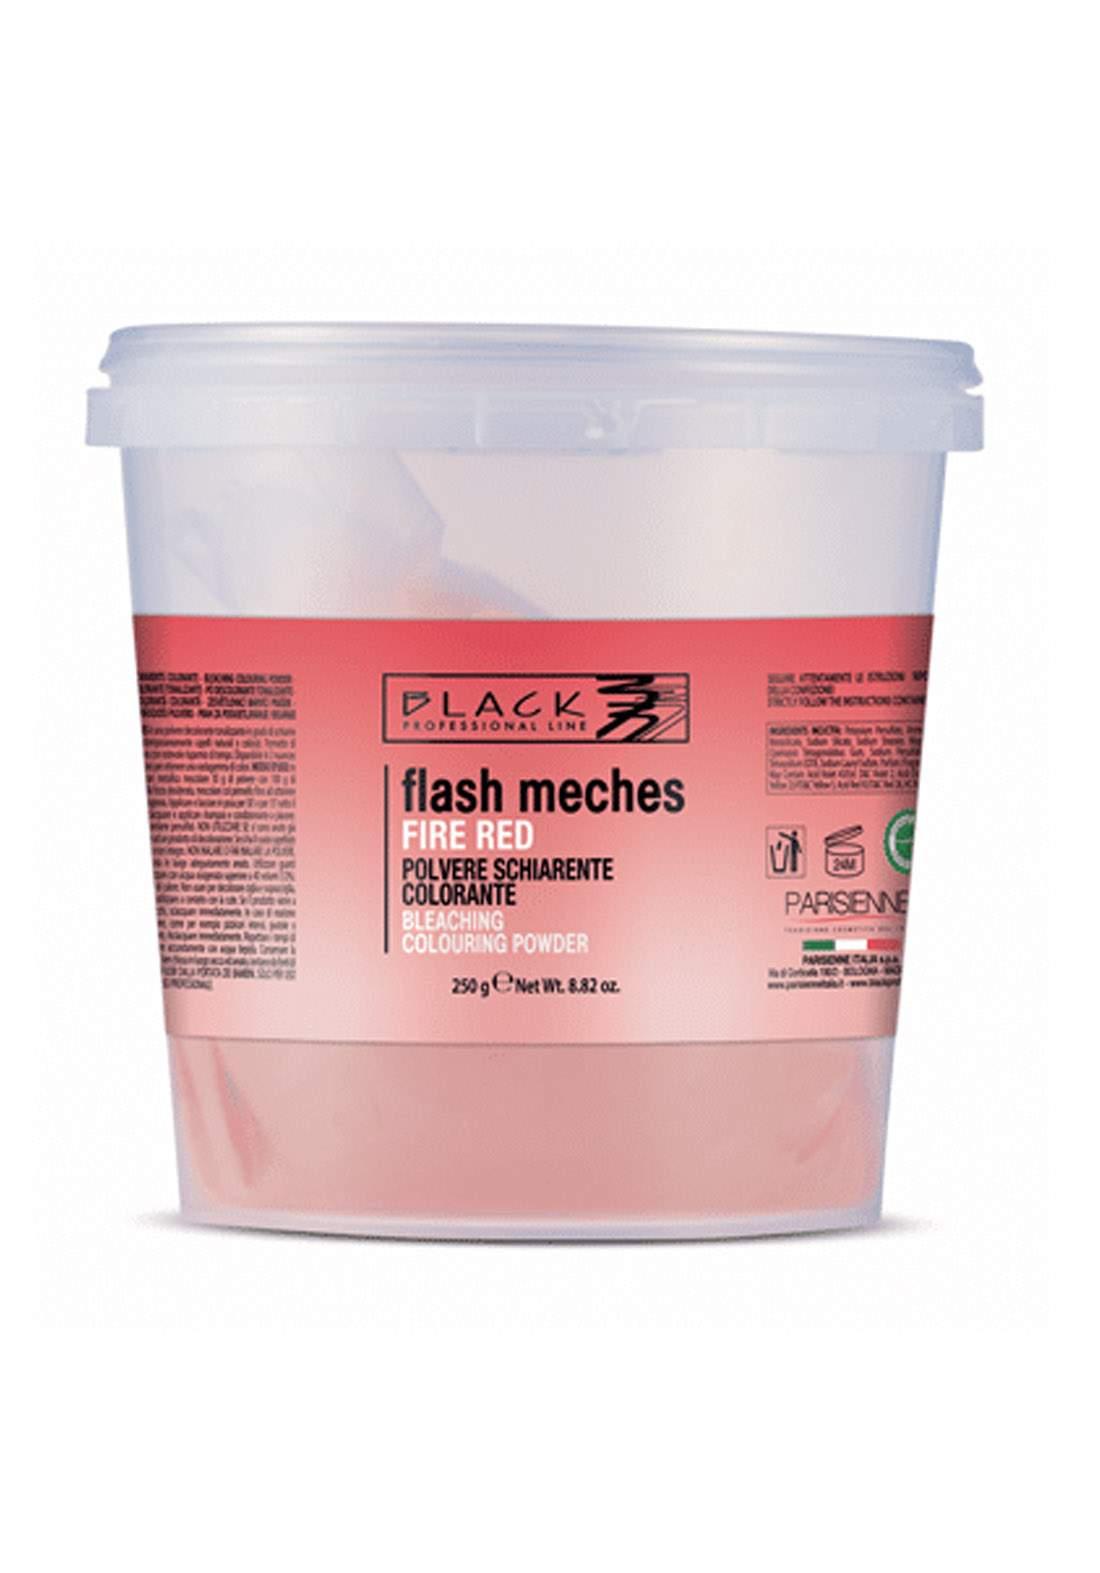 Black Flash Meches Tinting Bleaching Powder 250g Magenta ميش بودرة